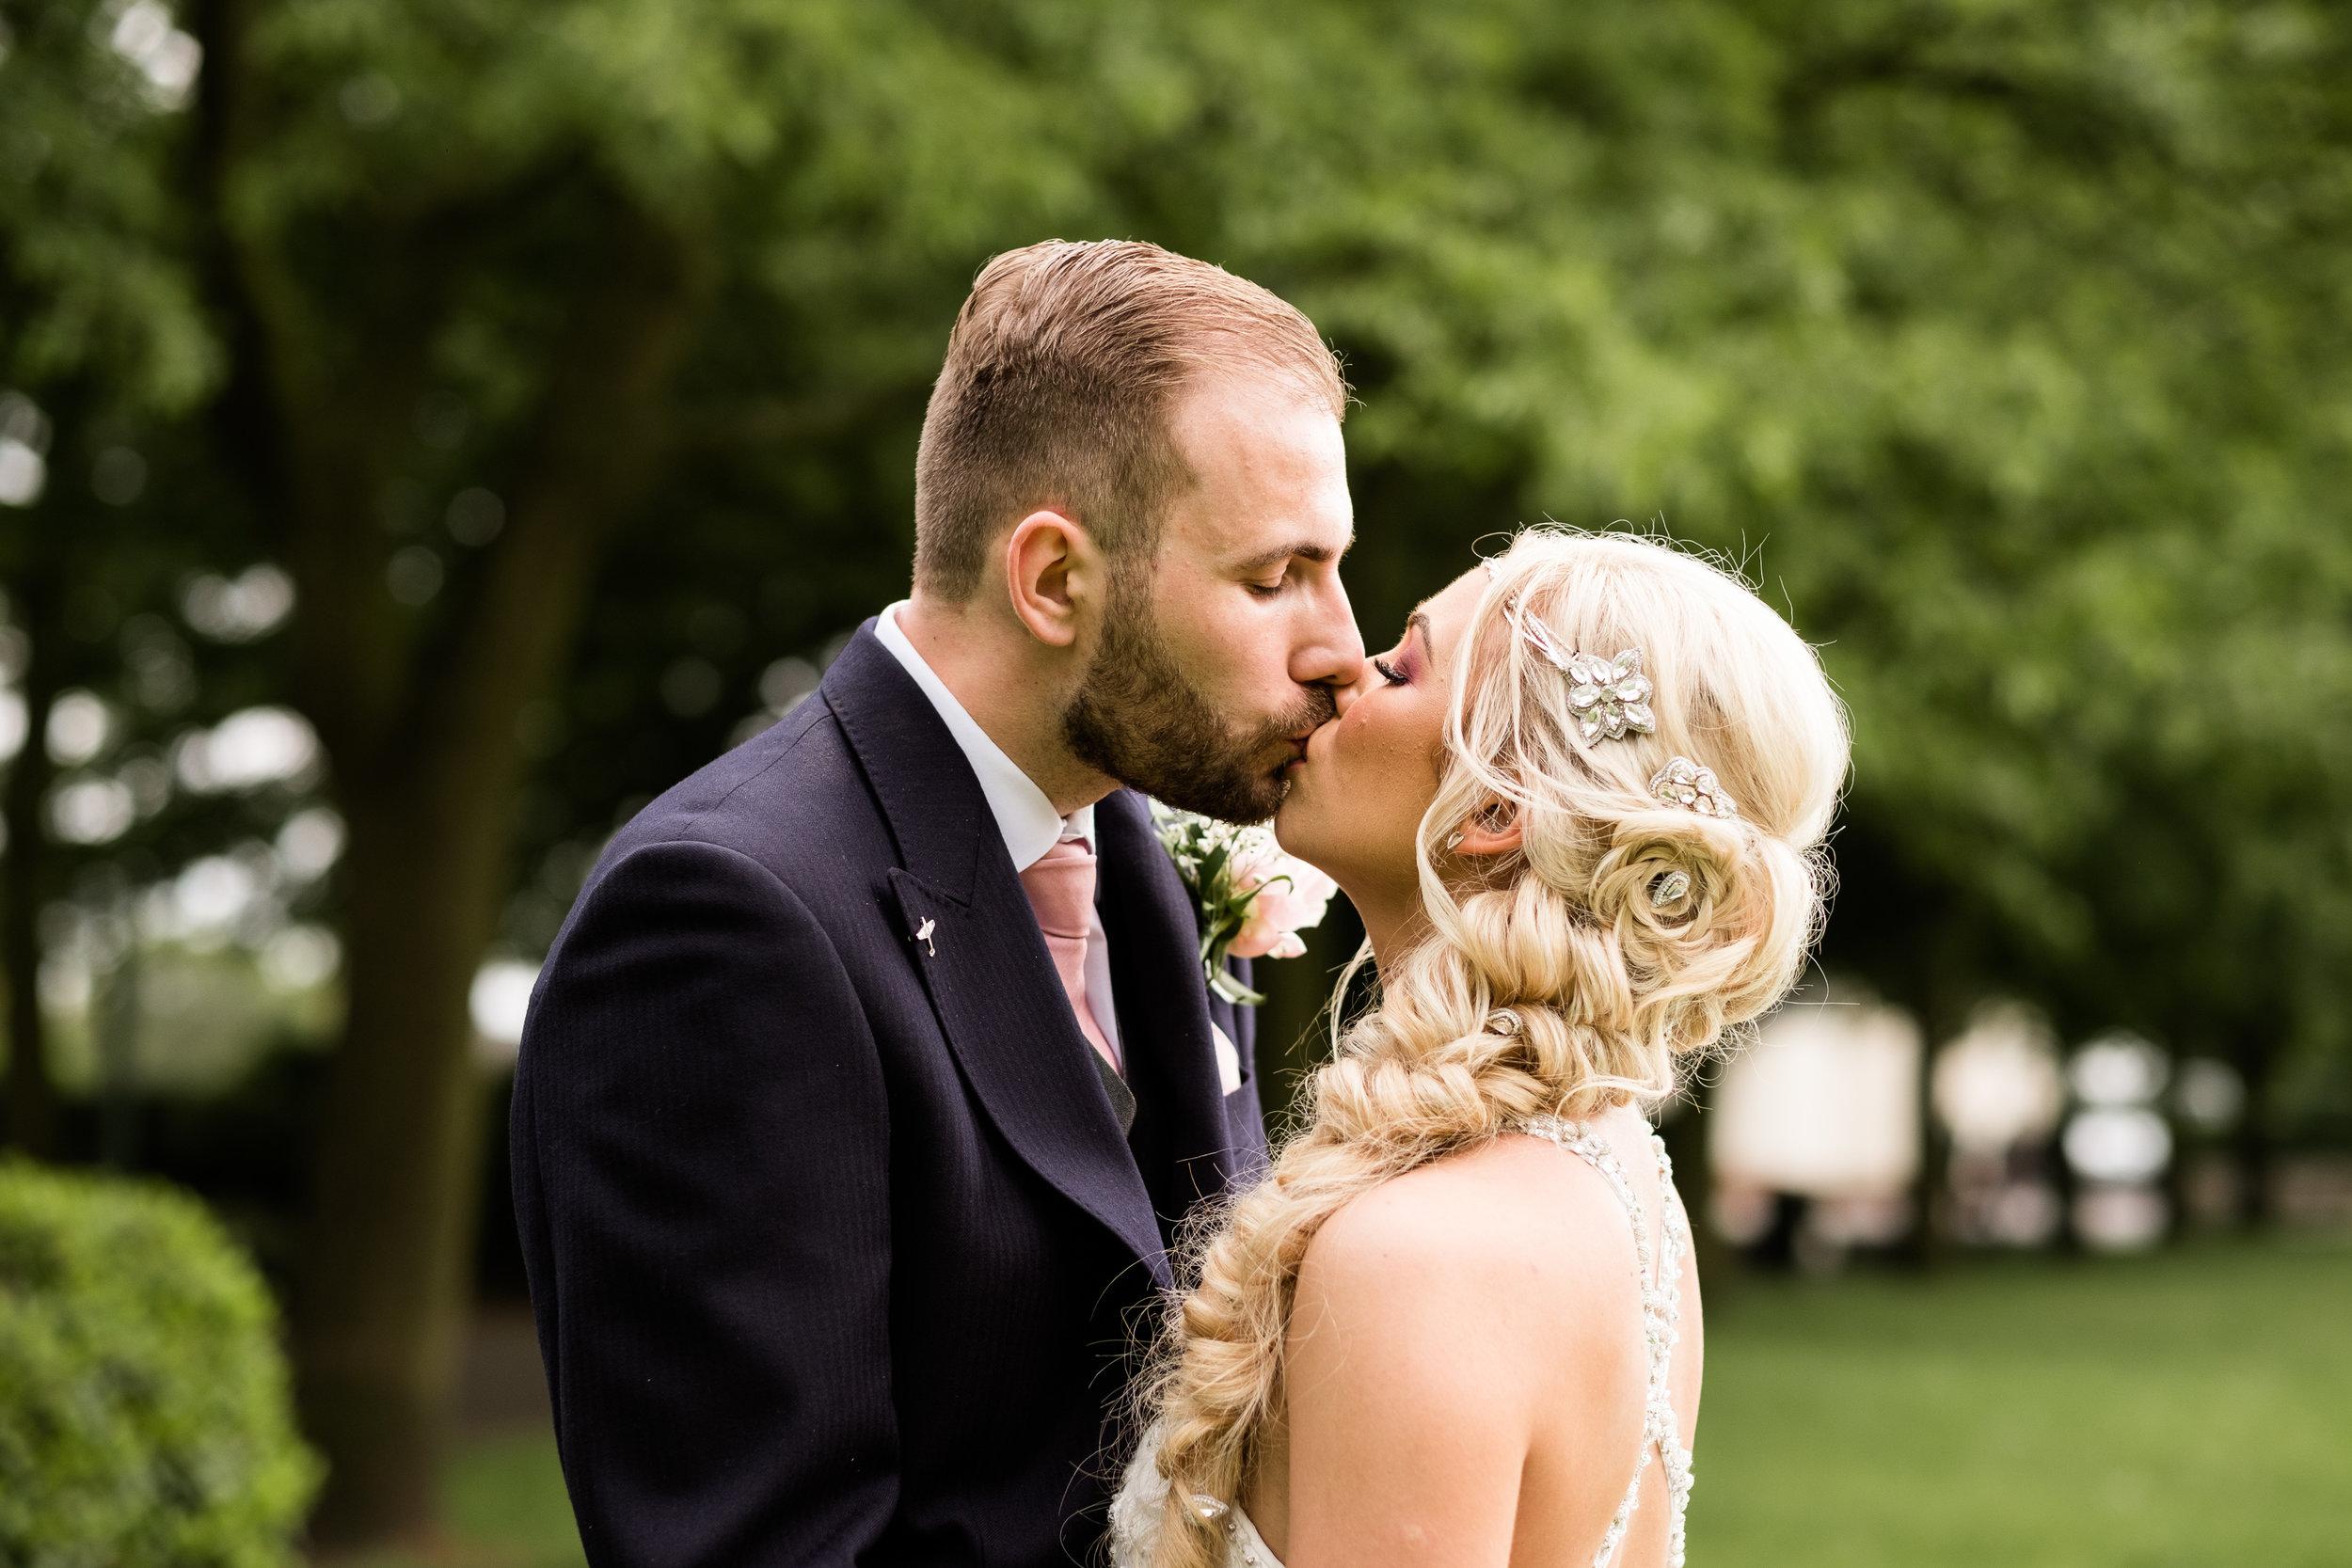 Summer Documentary Wedding Photography Floral Hall, Stoke-on-Trent, Staffordshire - Jenny Harper-36.jpg